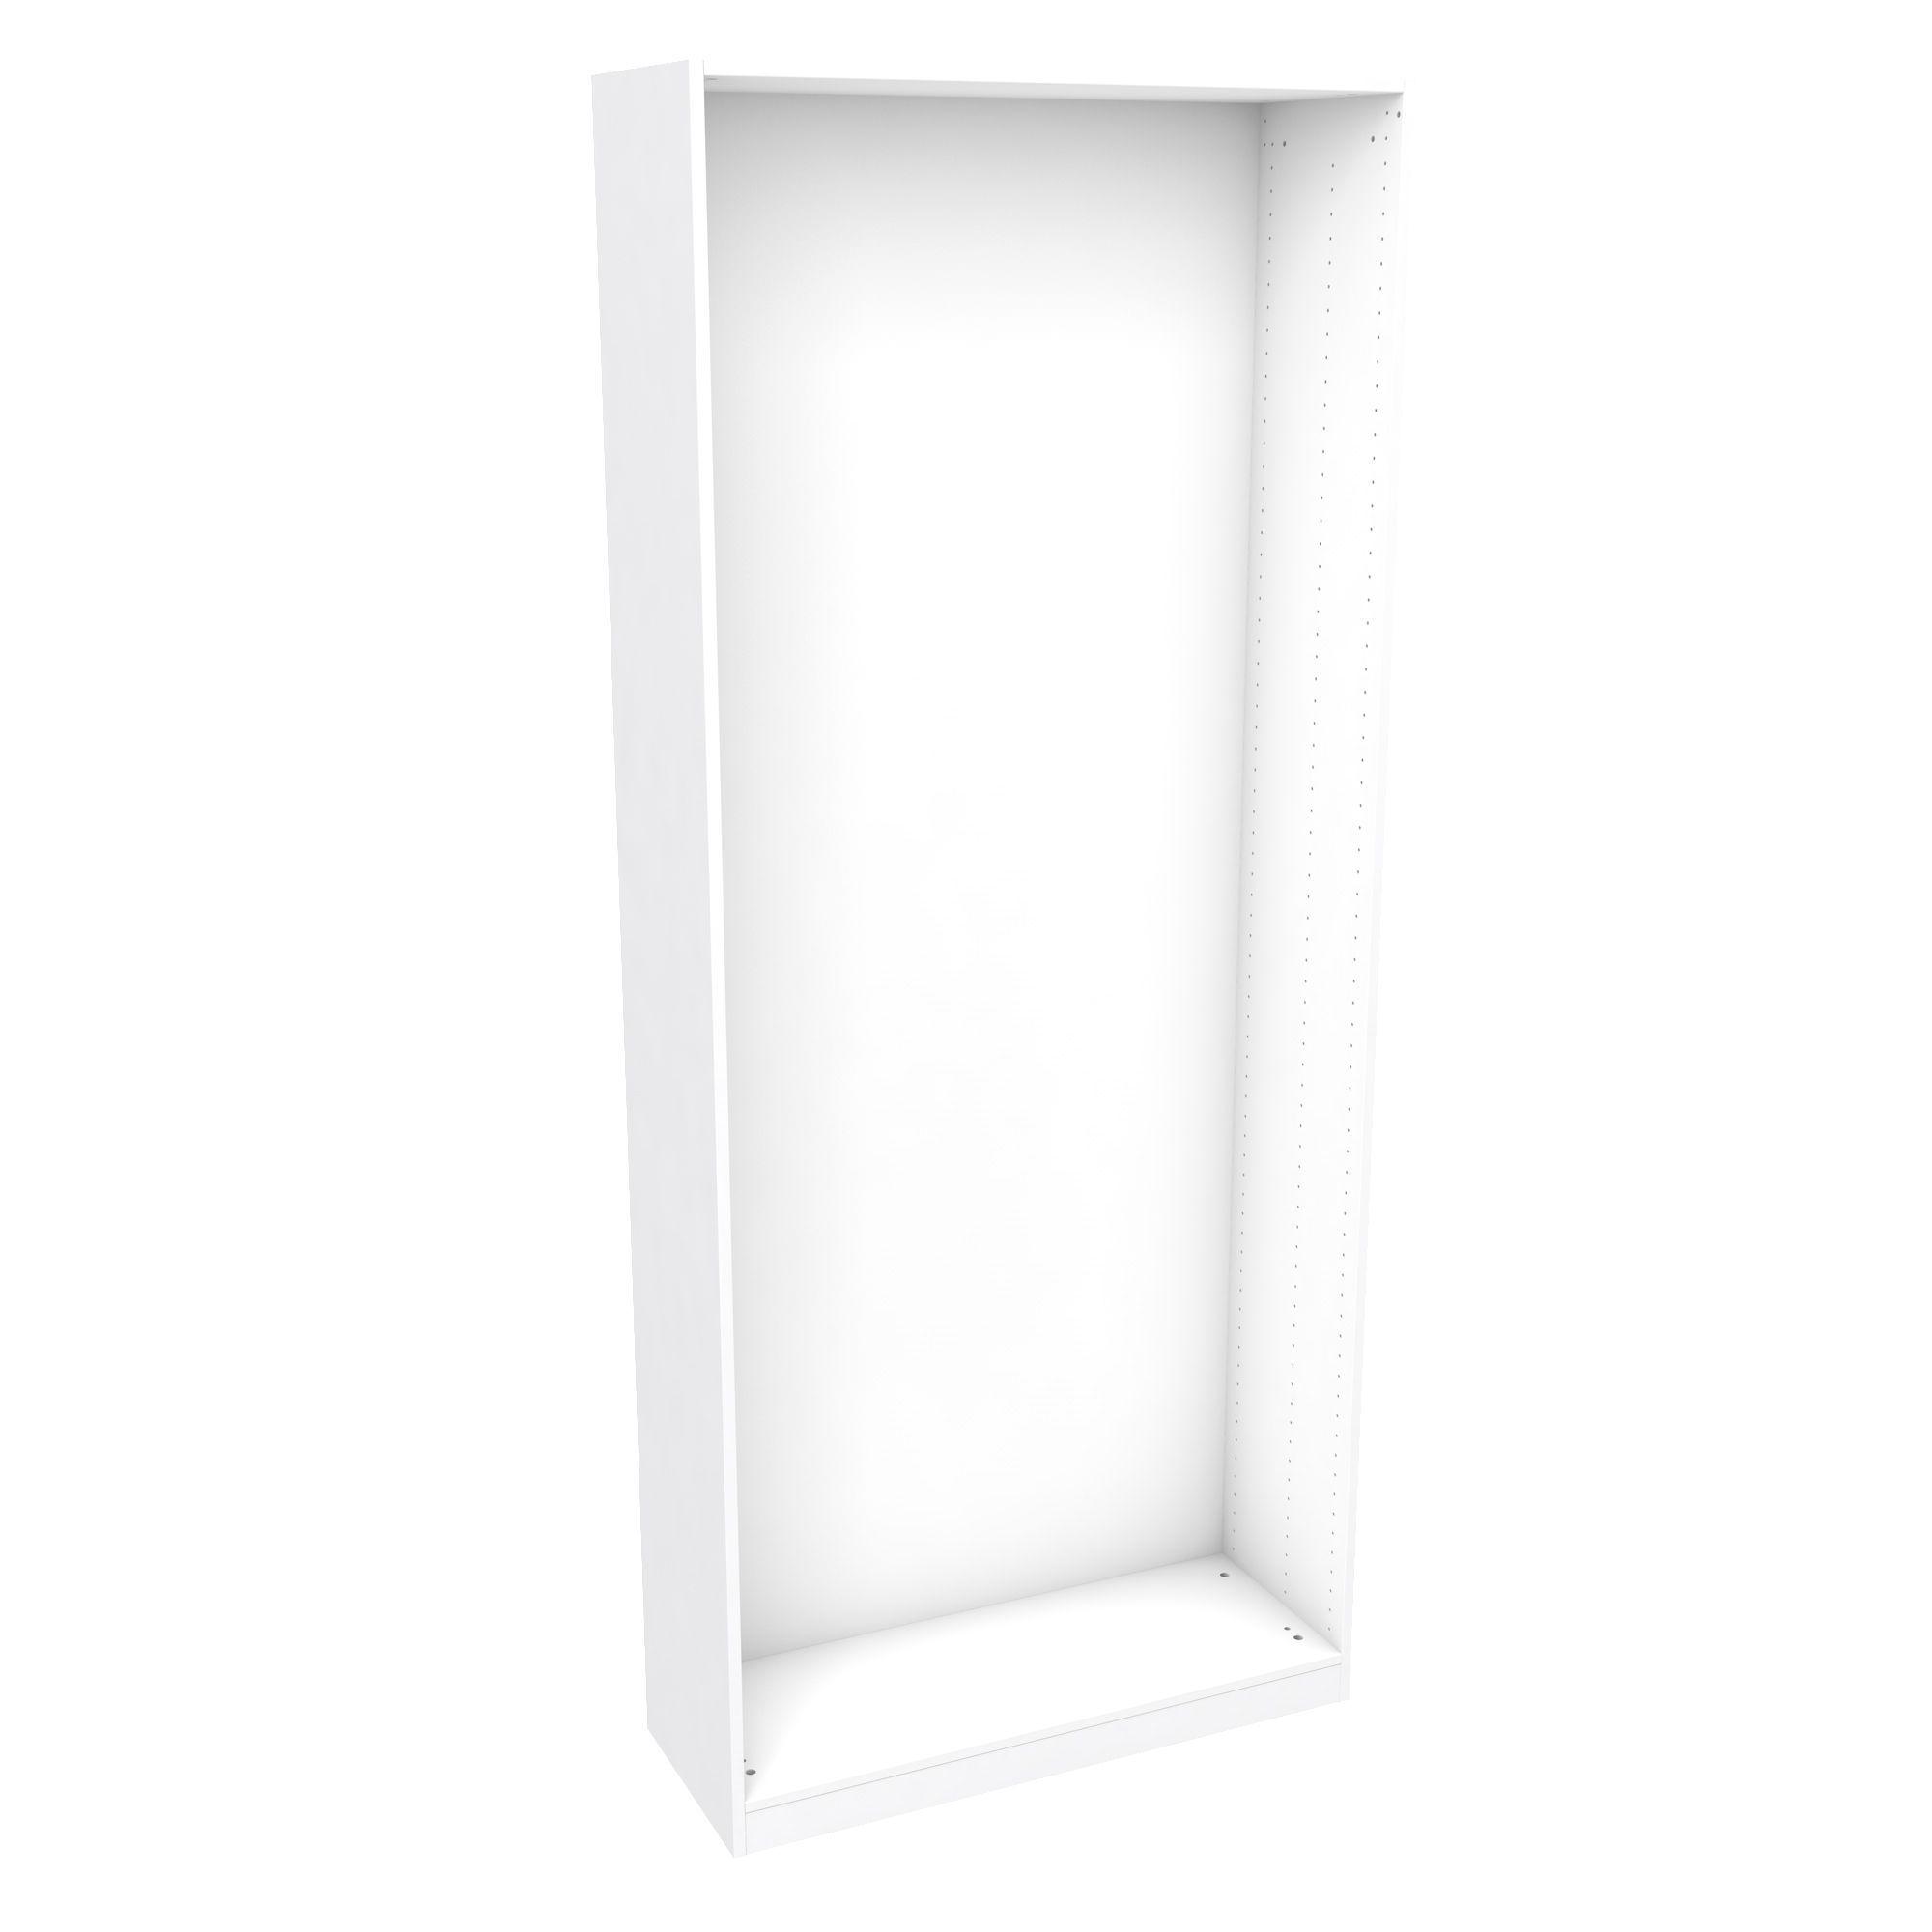 Darwin Modular White Tall Wardrobe Cabinet (h)2356mm (w)1000mm (d)374mm